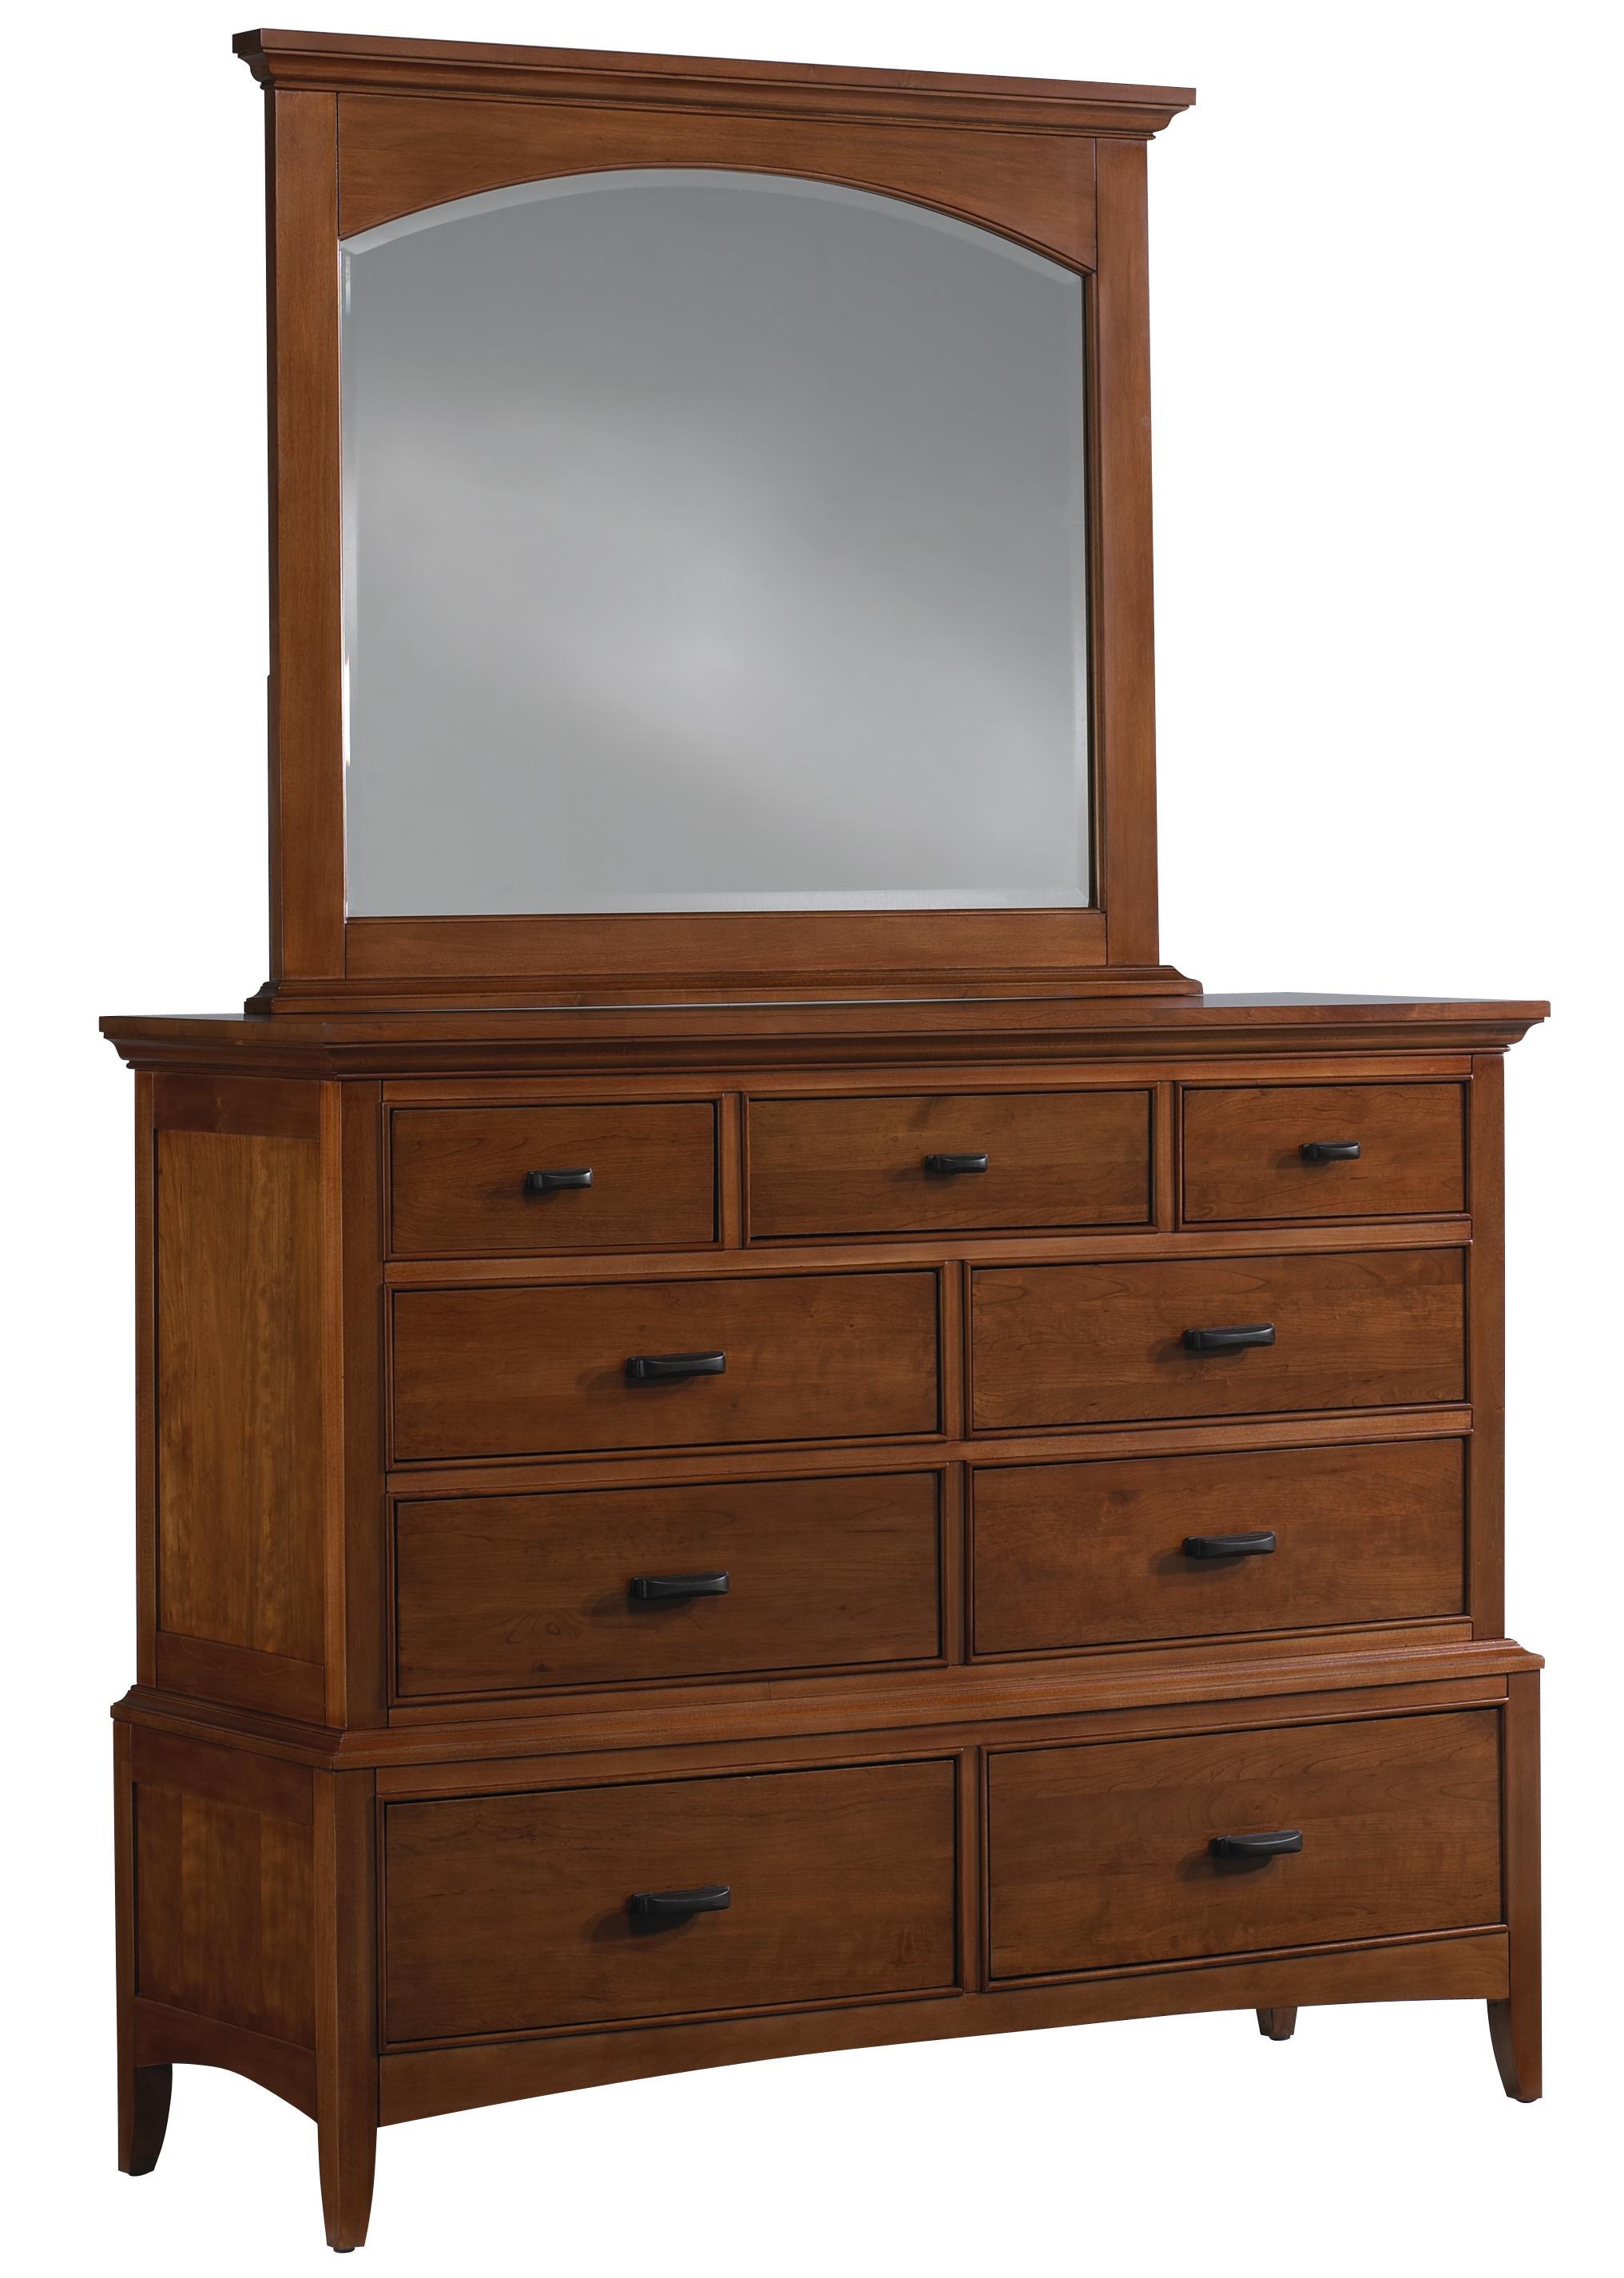 Cresent Fine Furniture Cresent Classics - Modern Shaker Dresser & Mirror - Item Number: 13-01+02